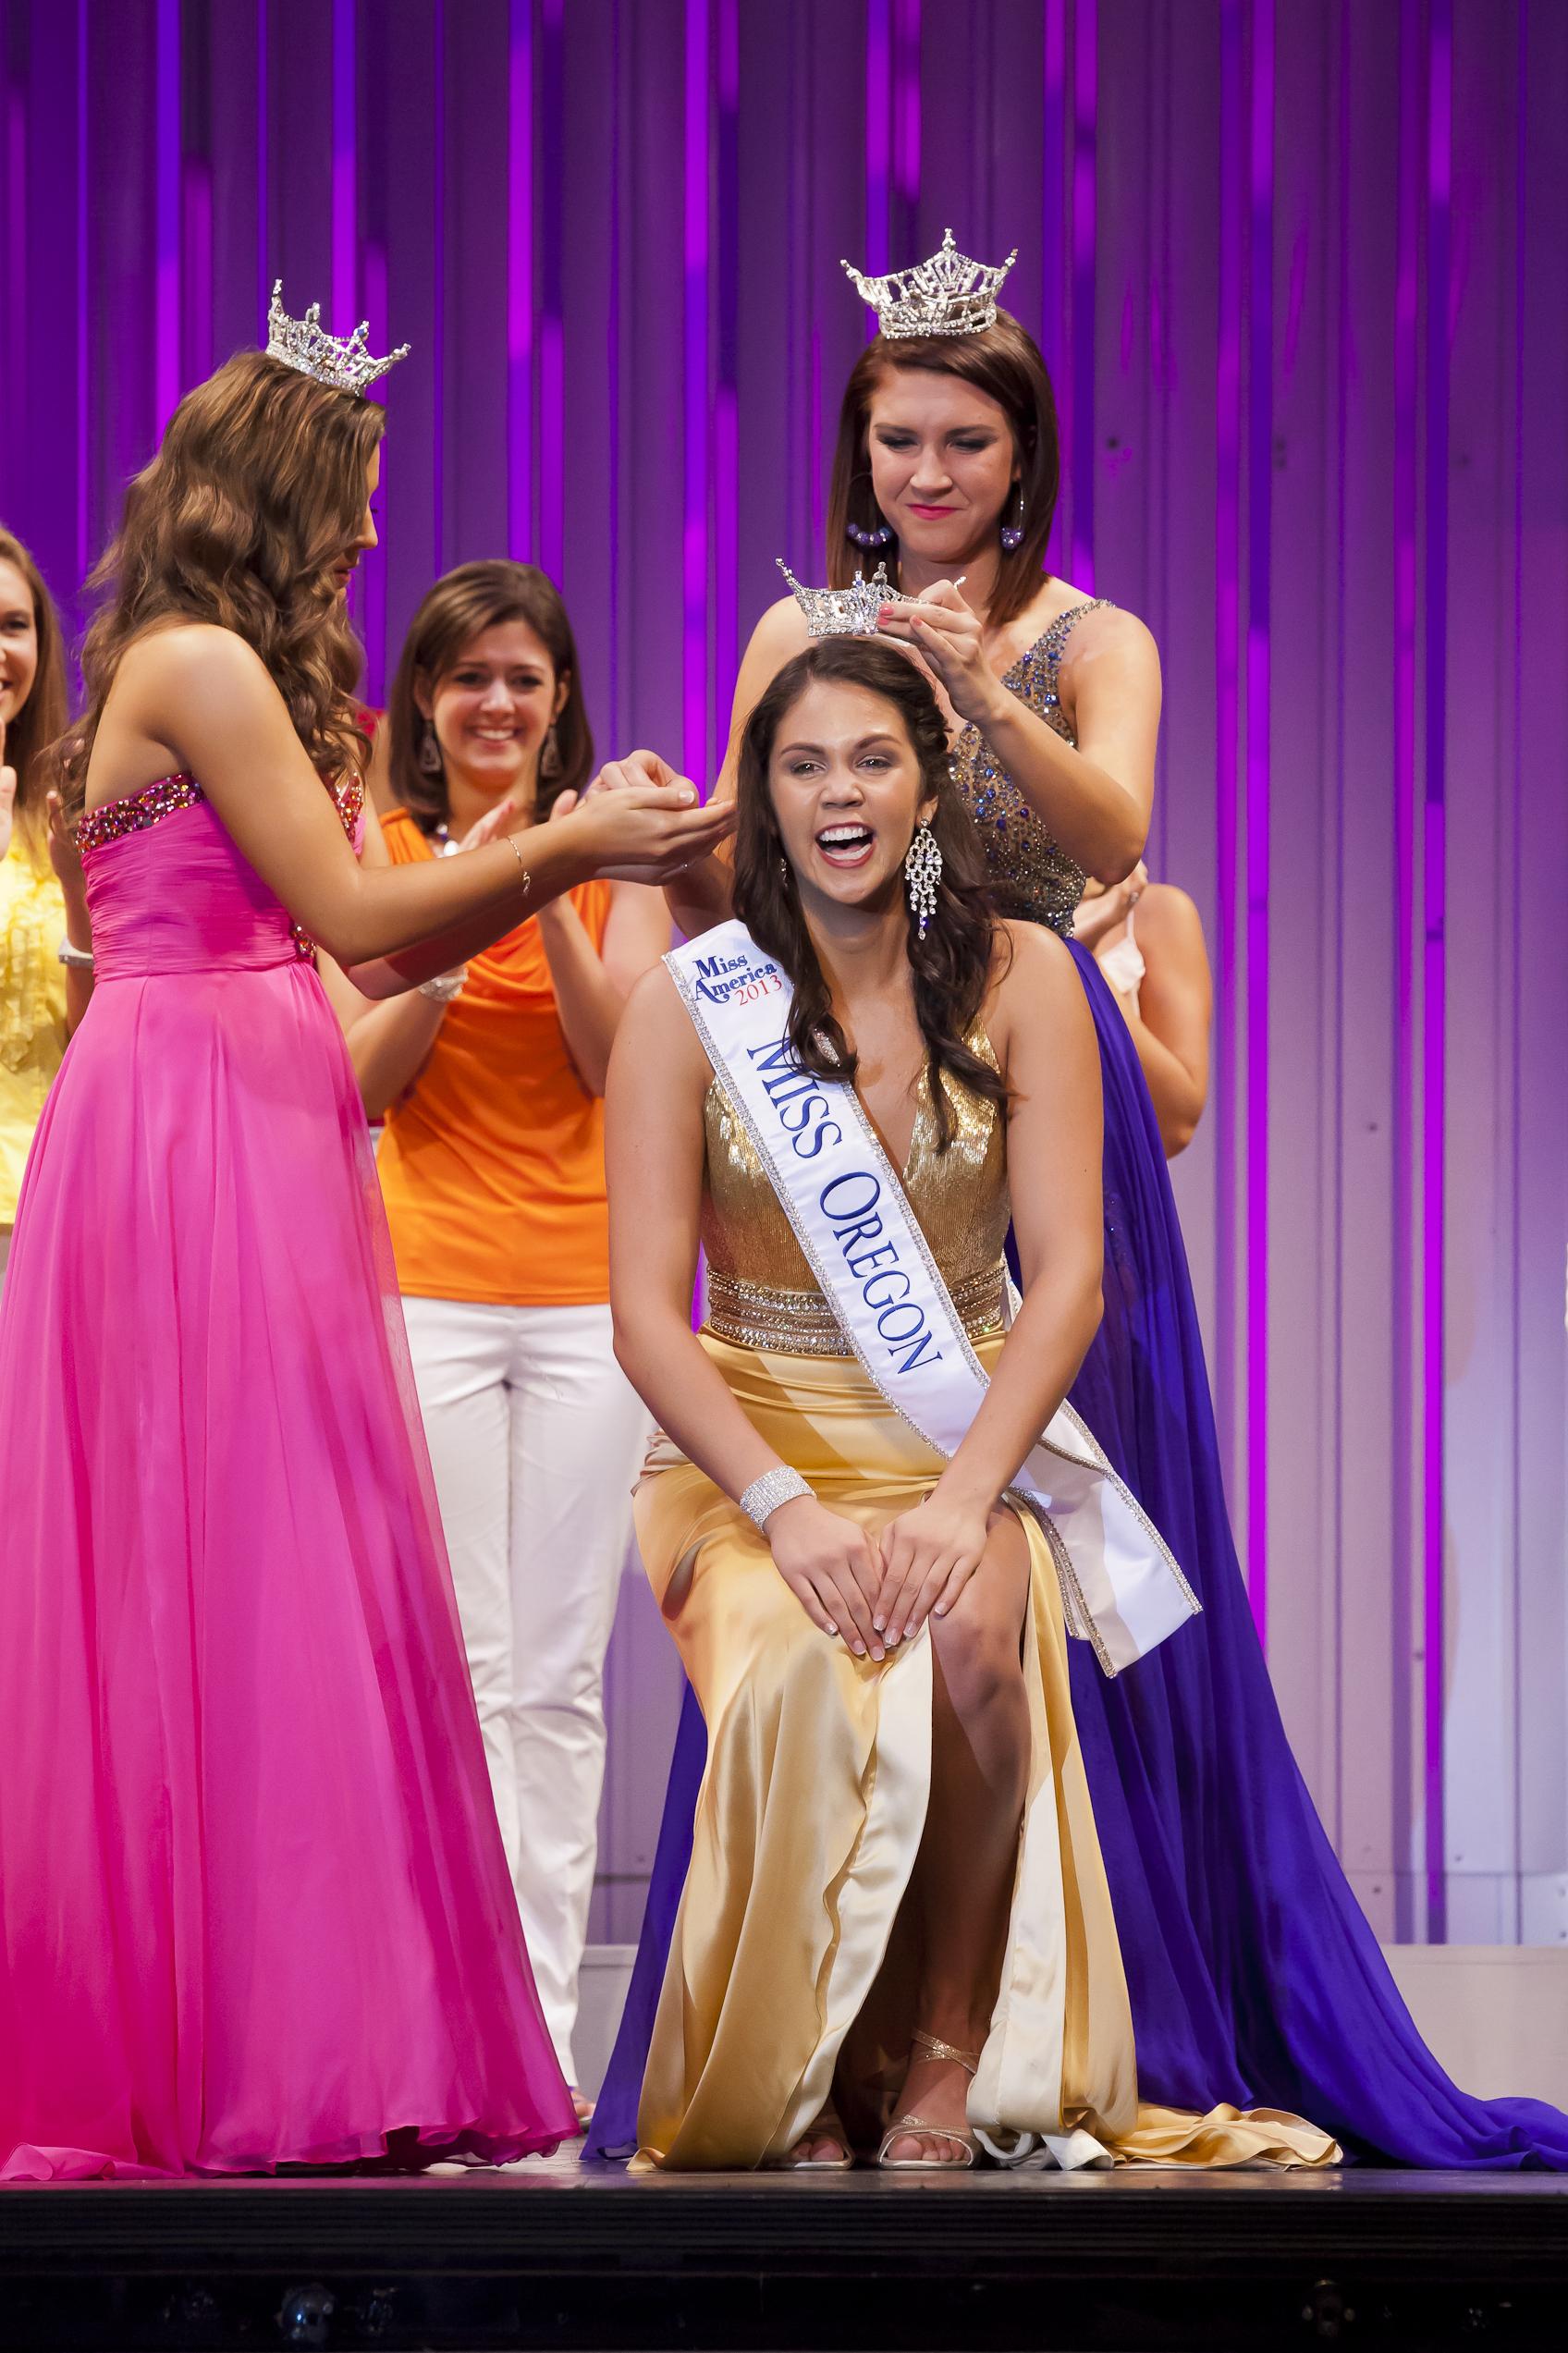 Miss Oregon, Allison Cook